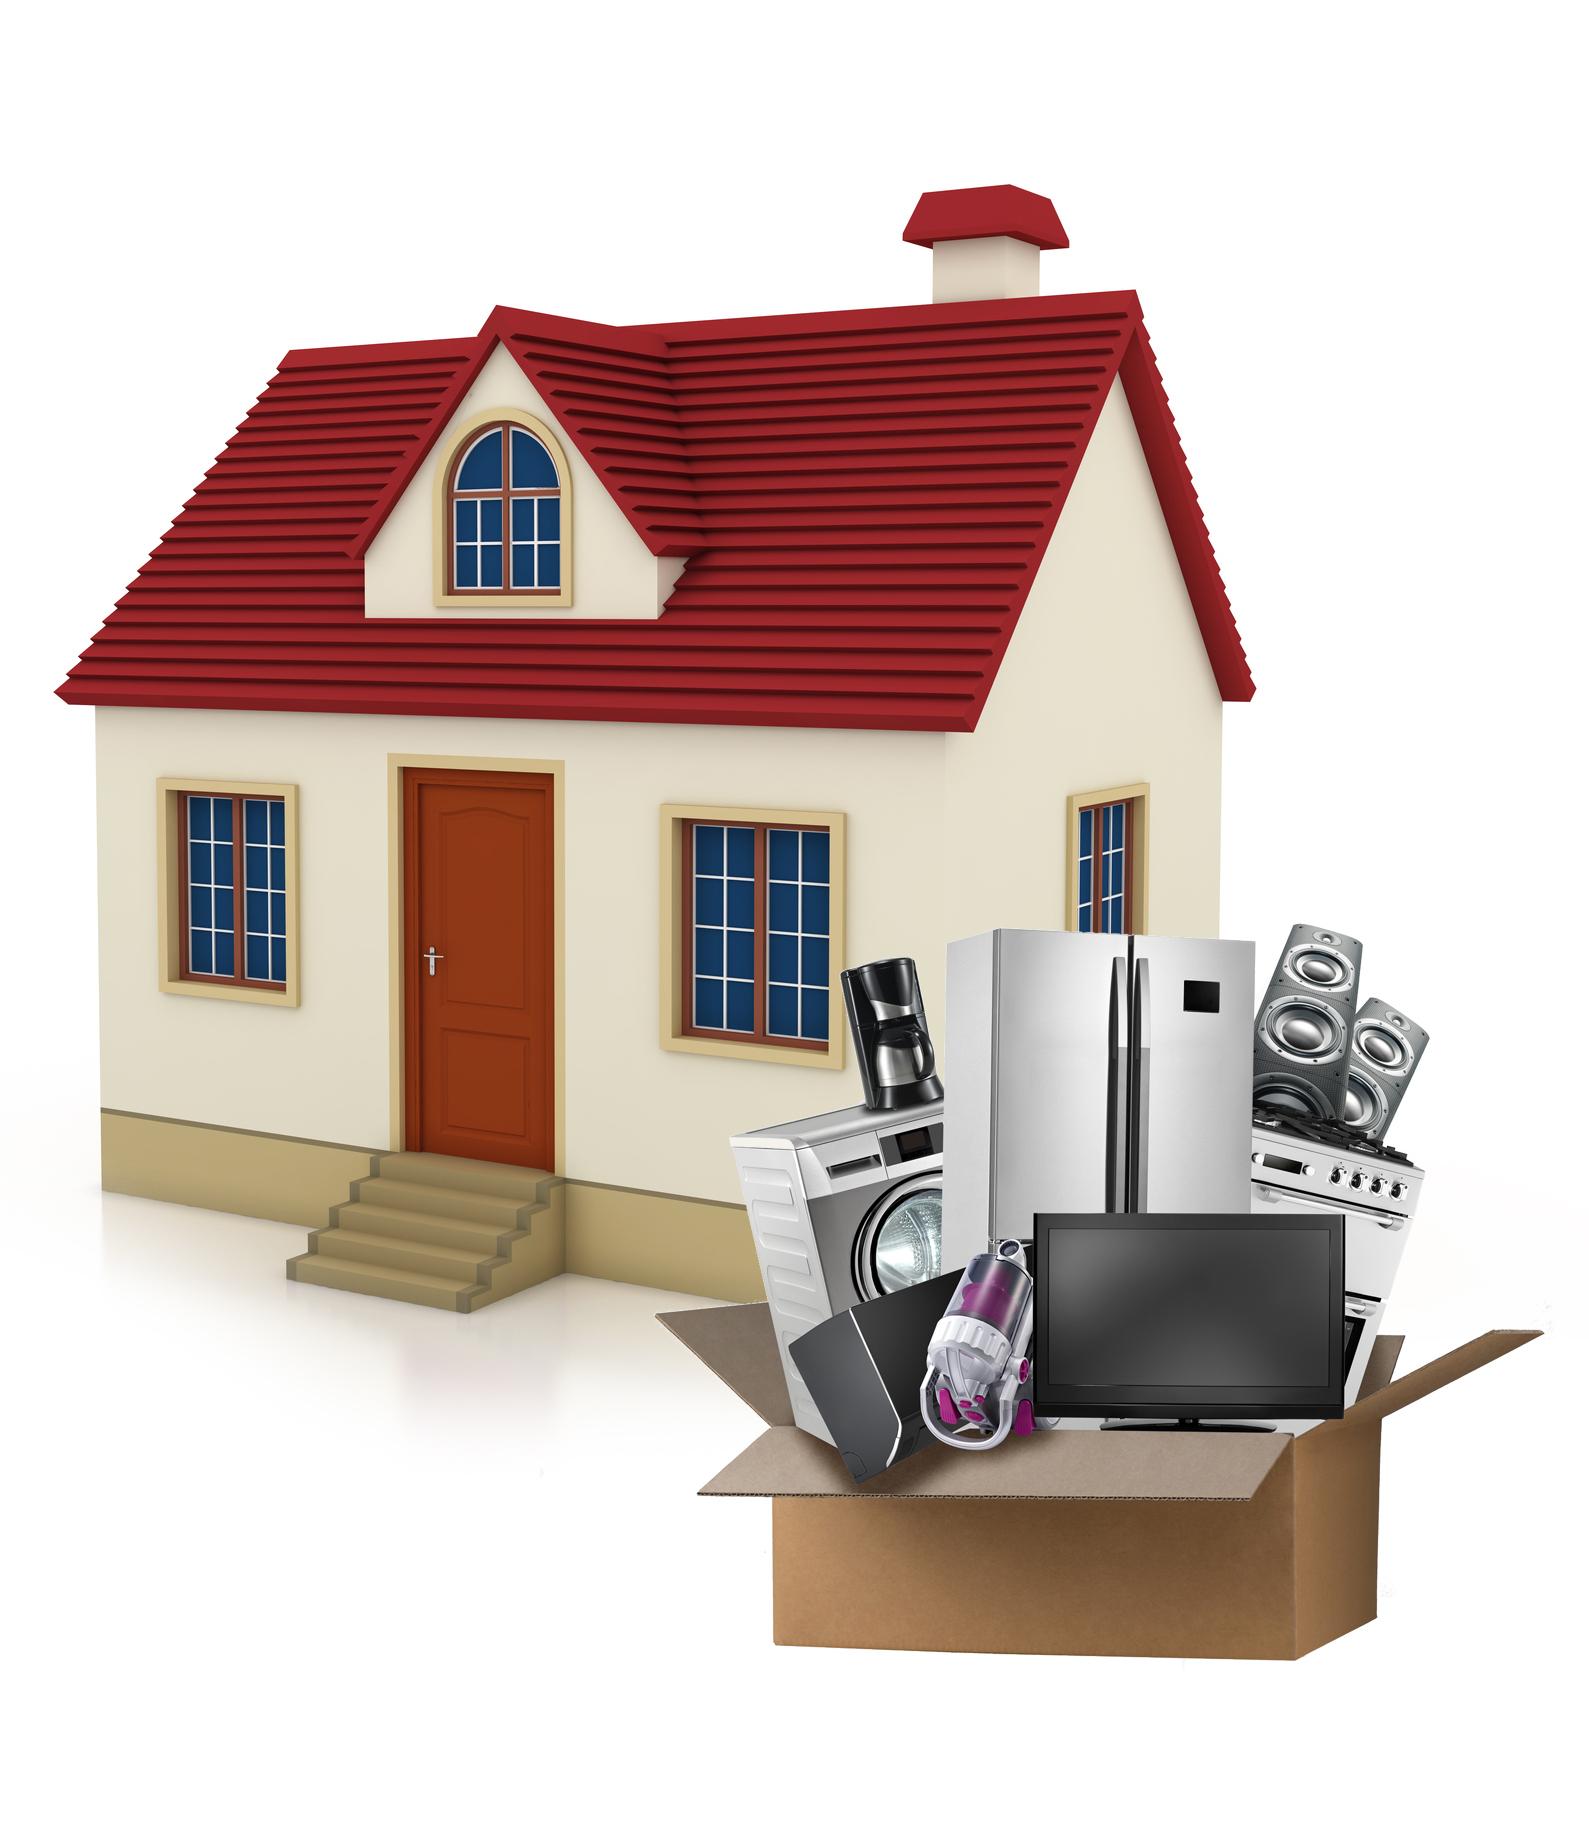 Home Model 3D Rendering Image